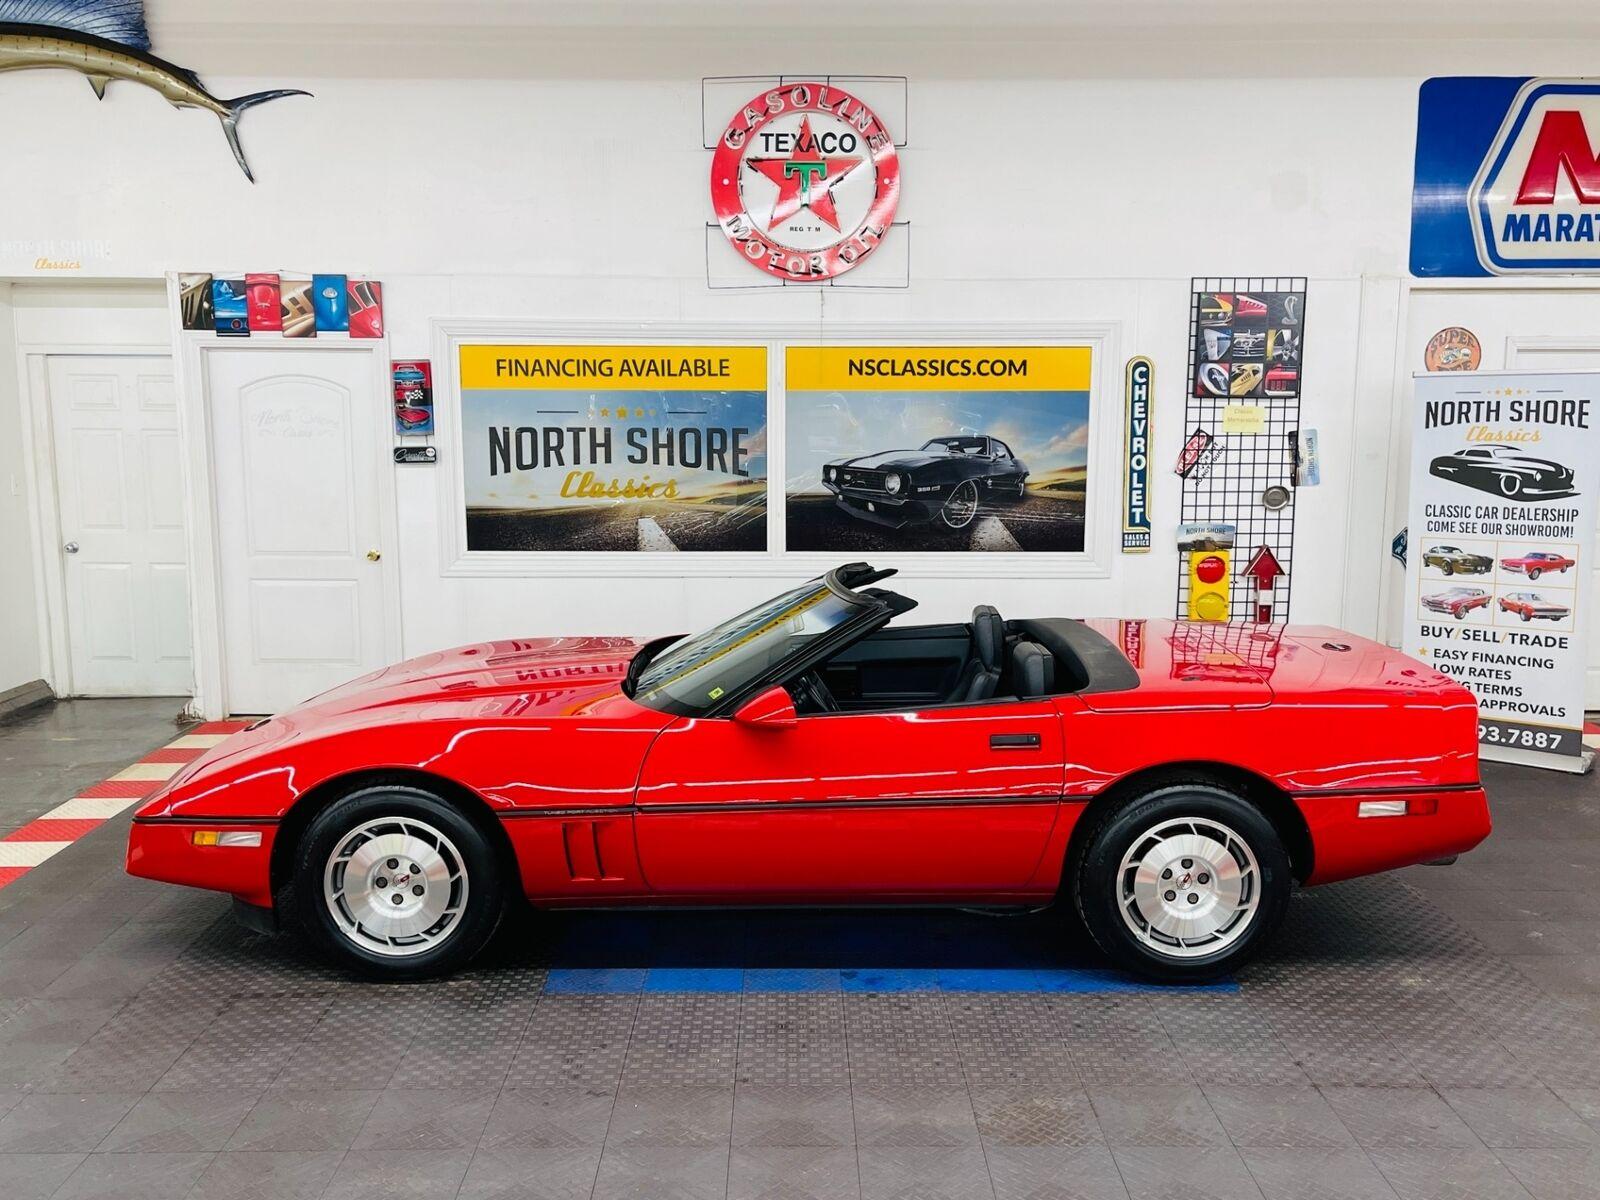 1986 Red Chevrolet Corvette Convertible  | C4 Corvette Photo 2